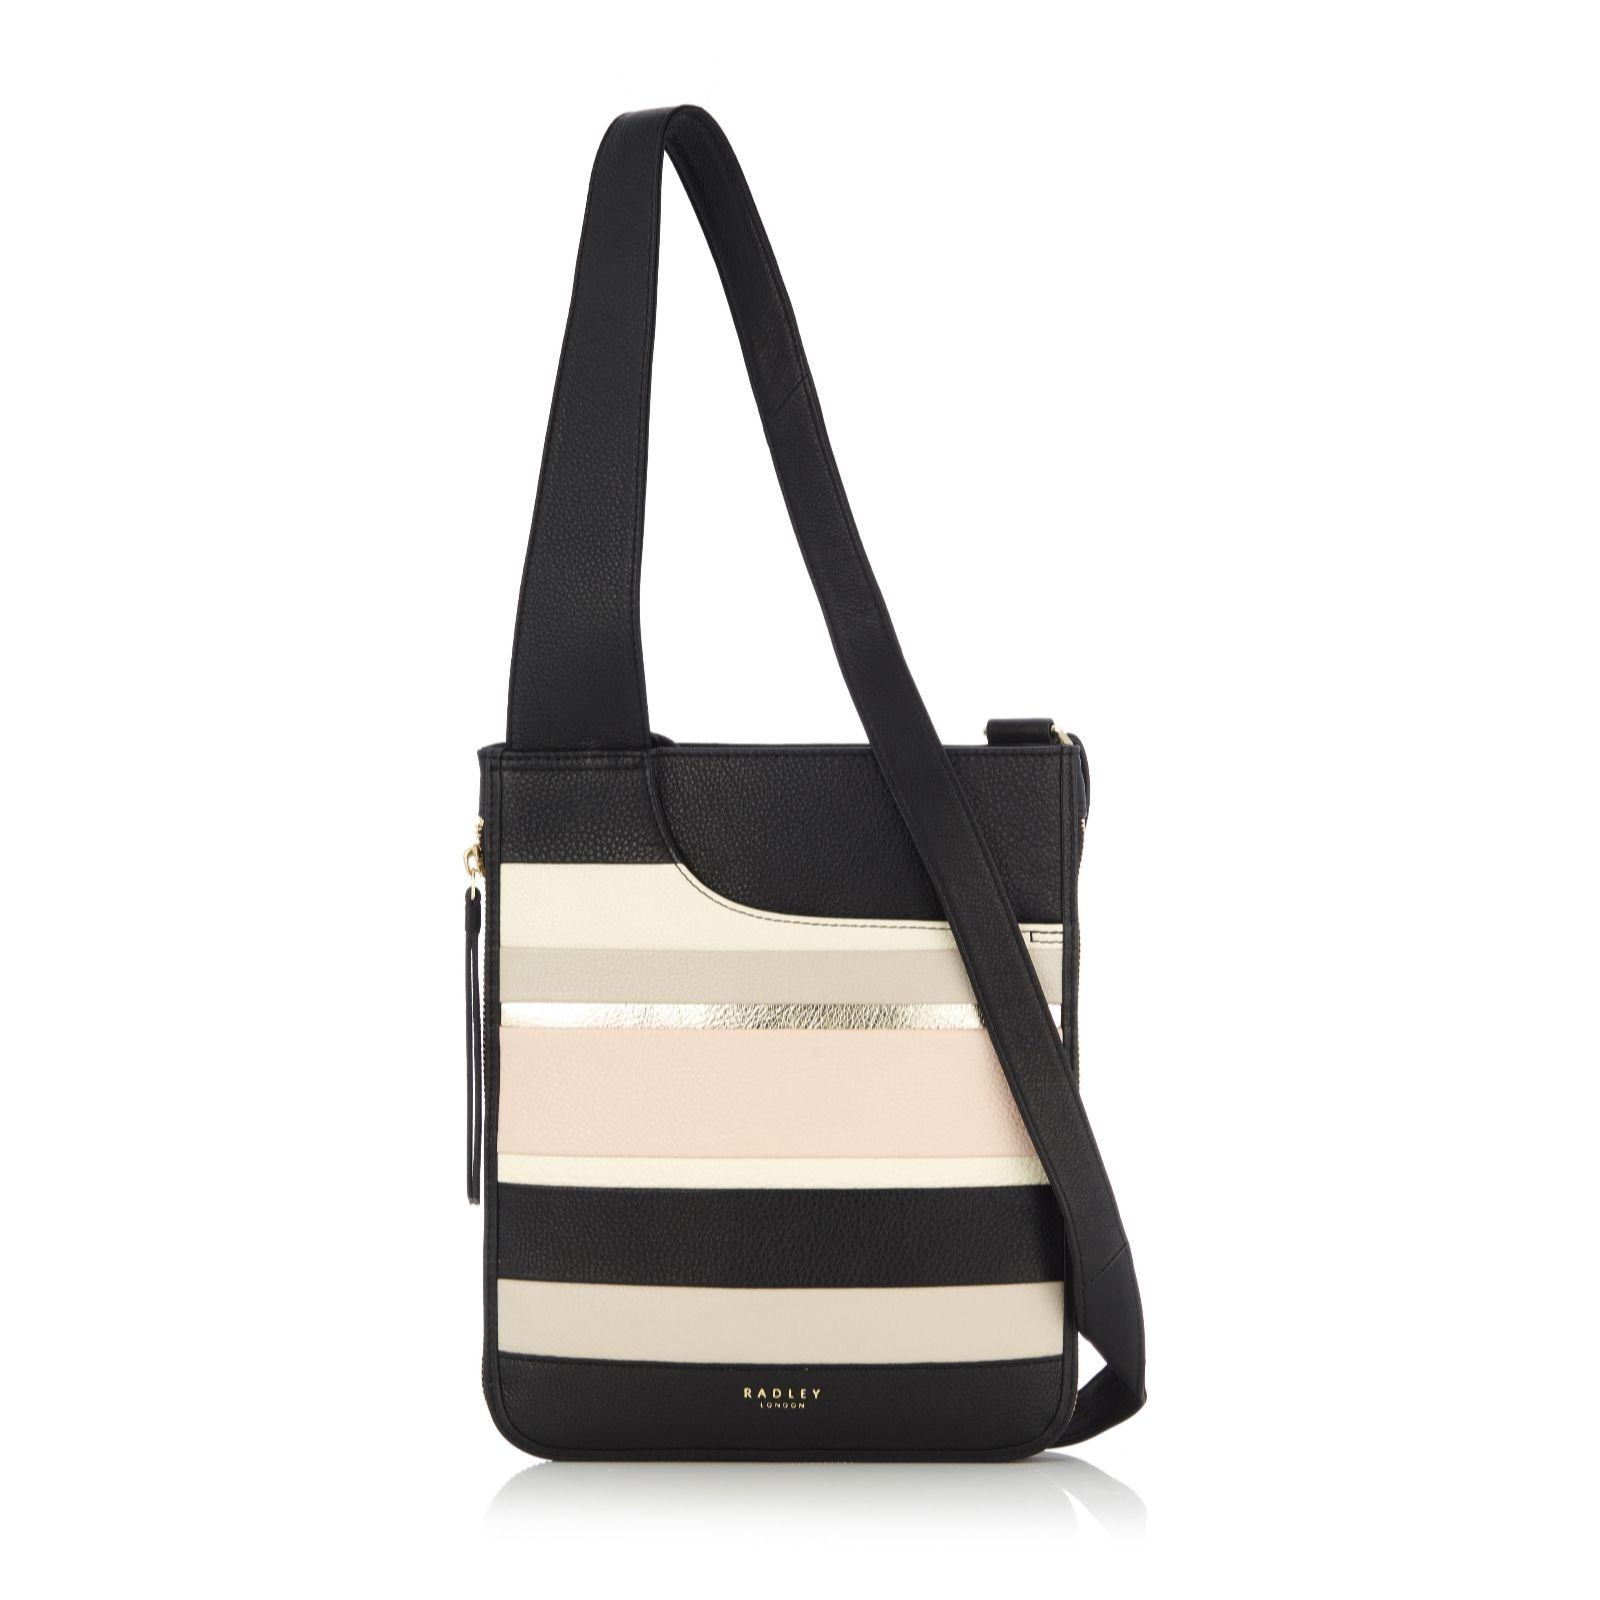 86a02cba02c7c Radley London Pockets Stripe Crossbody Bag - QVC UK